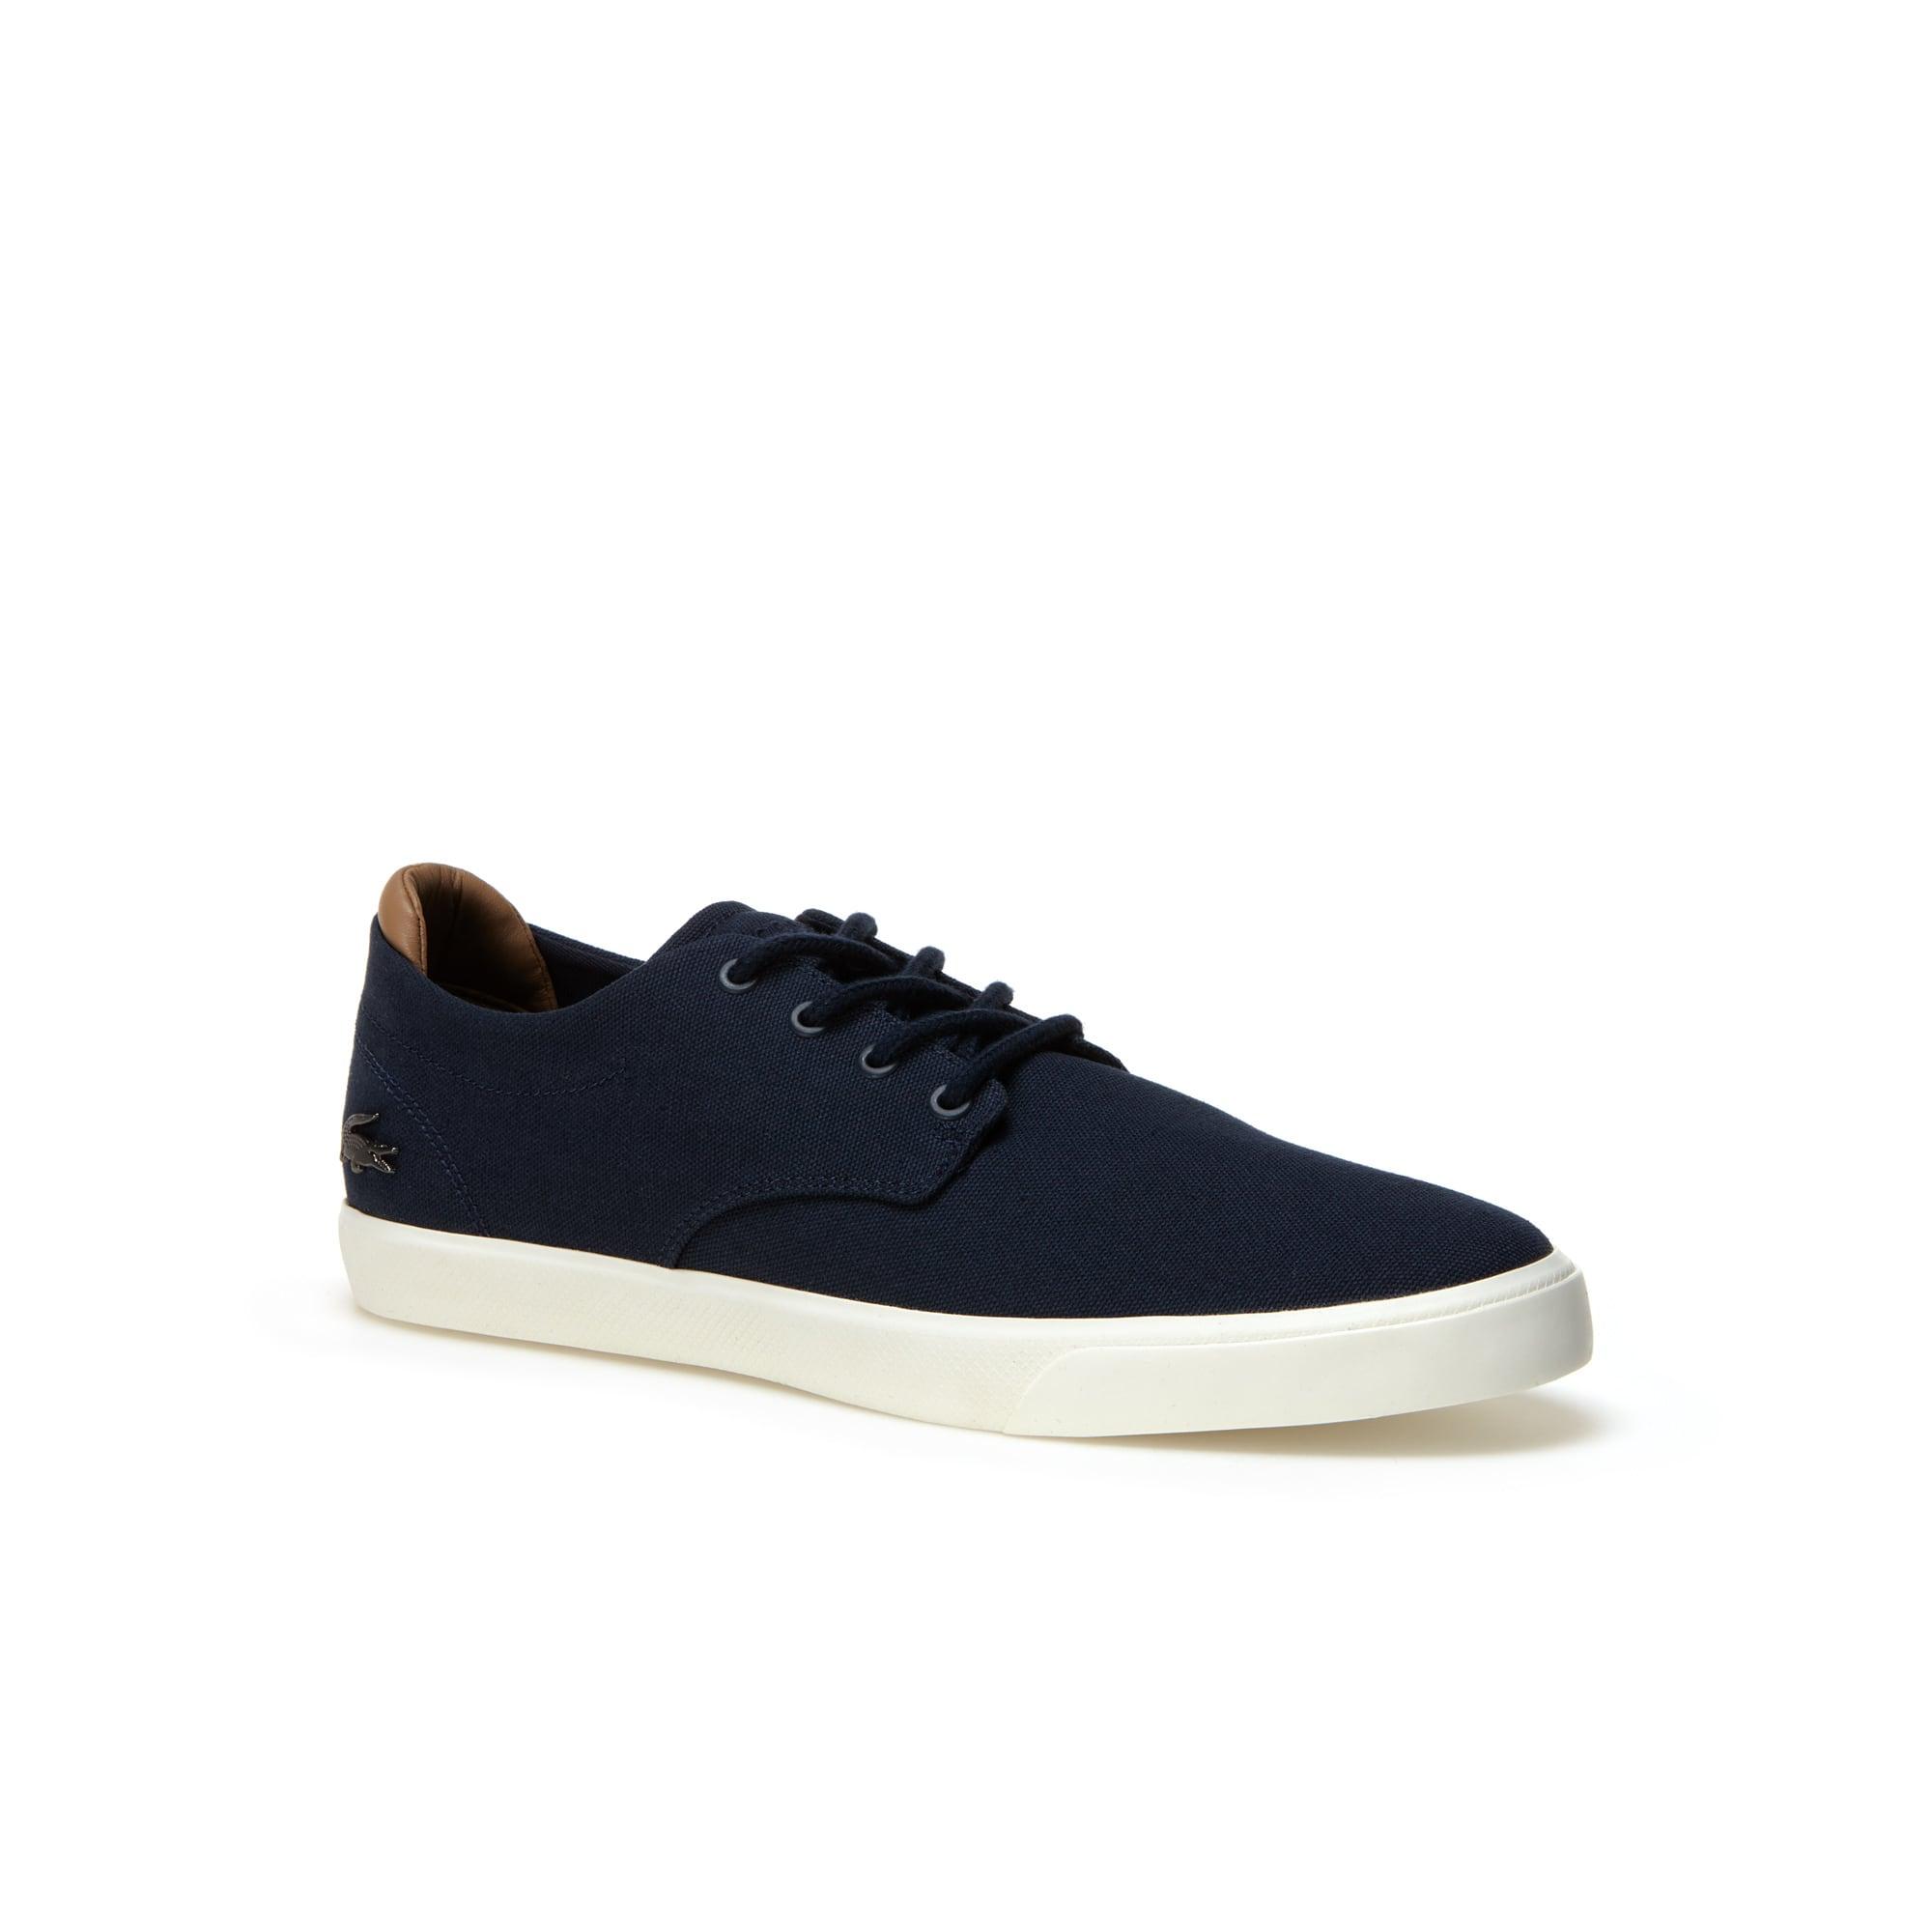 Men's Espere Canvas Sneakers